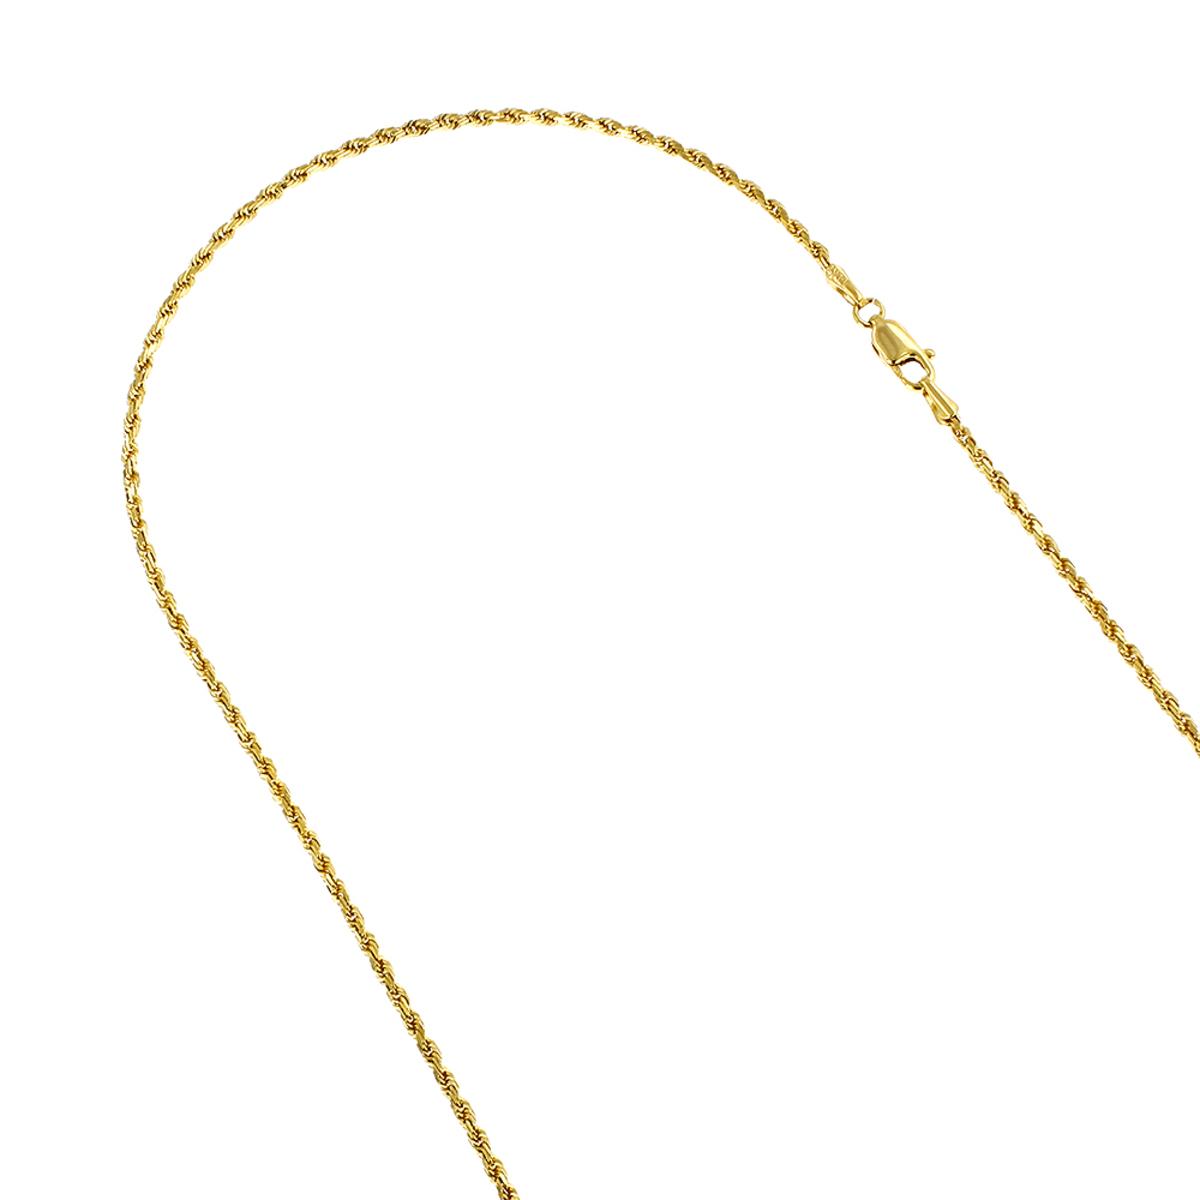 LUXURMAN Solid 14k Gold Rope Chain For Men & Women 2.5mm Wide